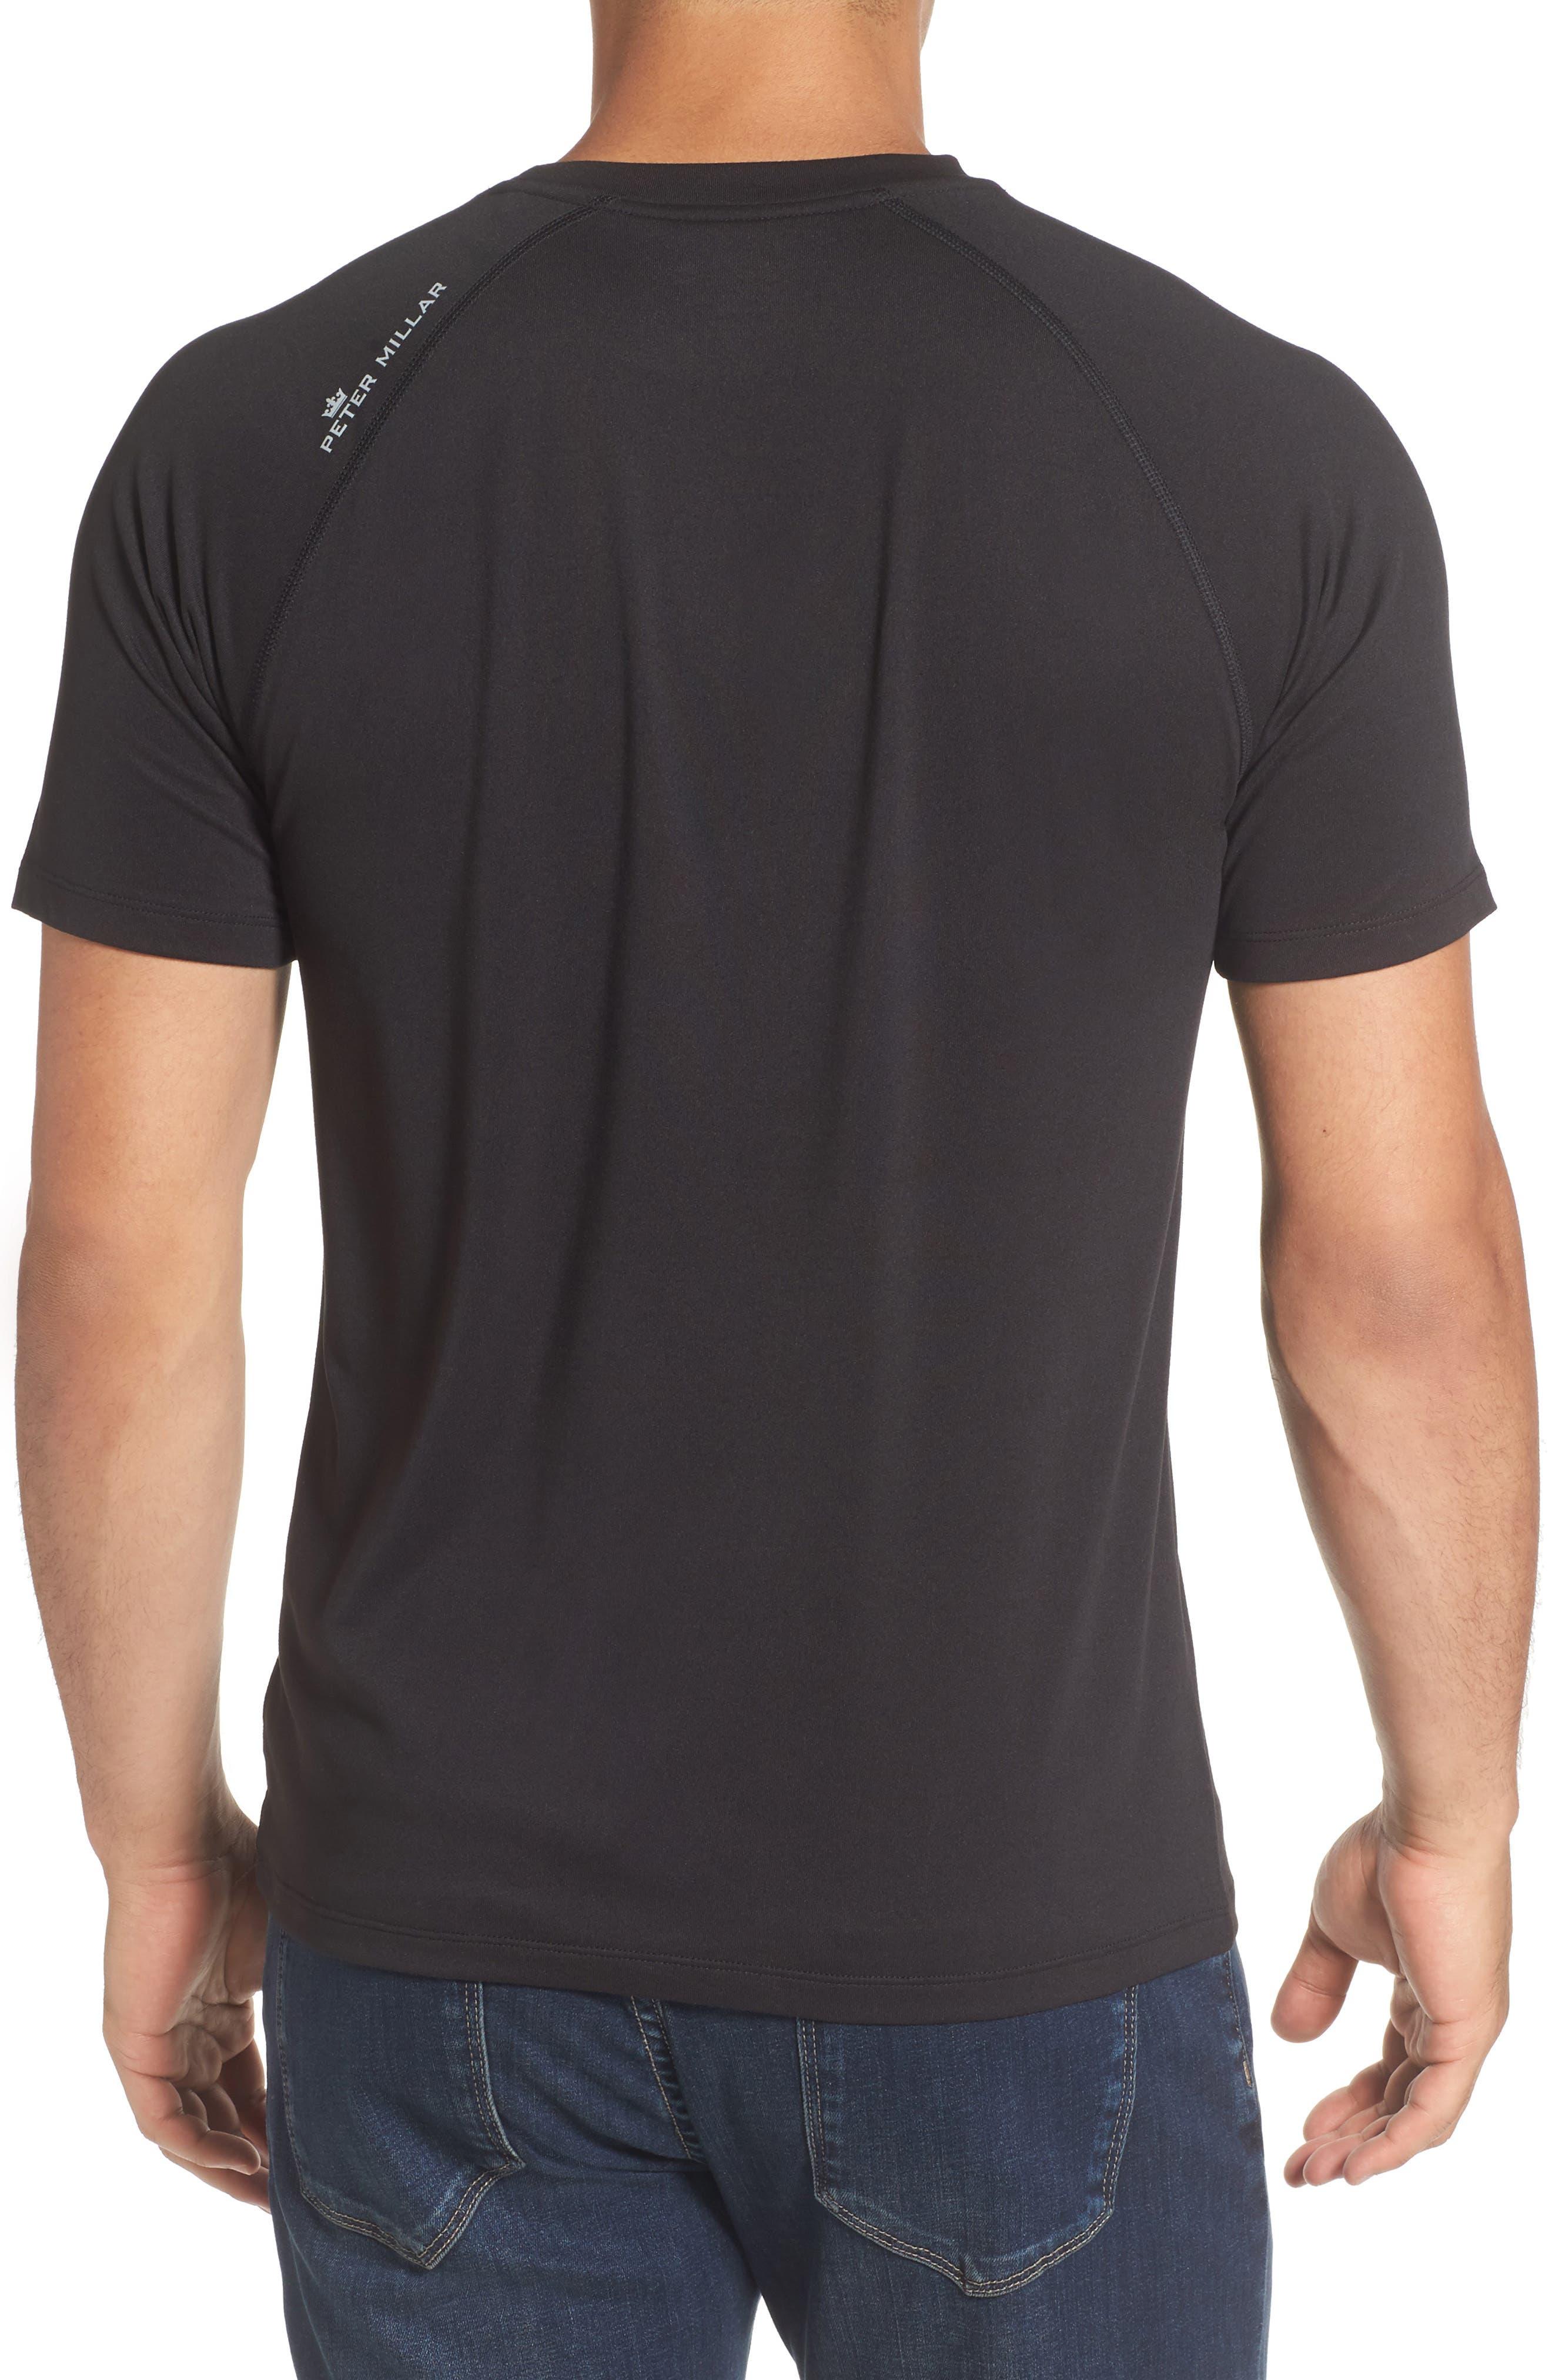 Rio Technical T-Shirt,                             Alternate thumbnail 2, color,                             001